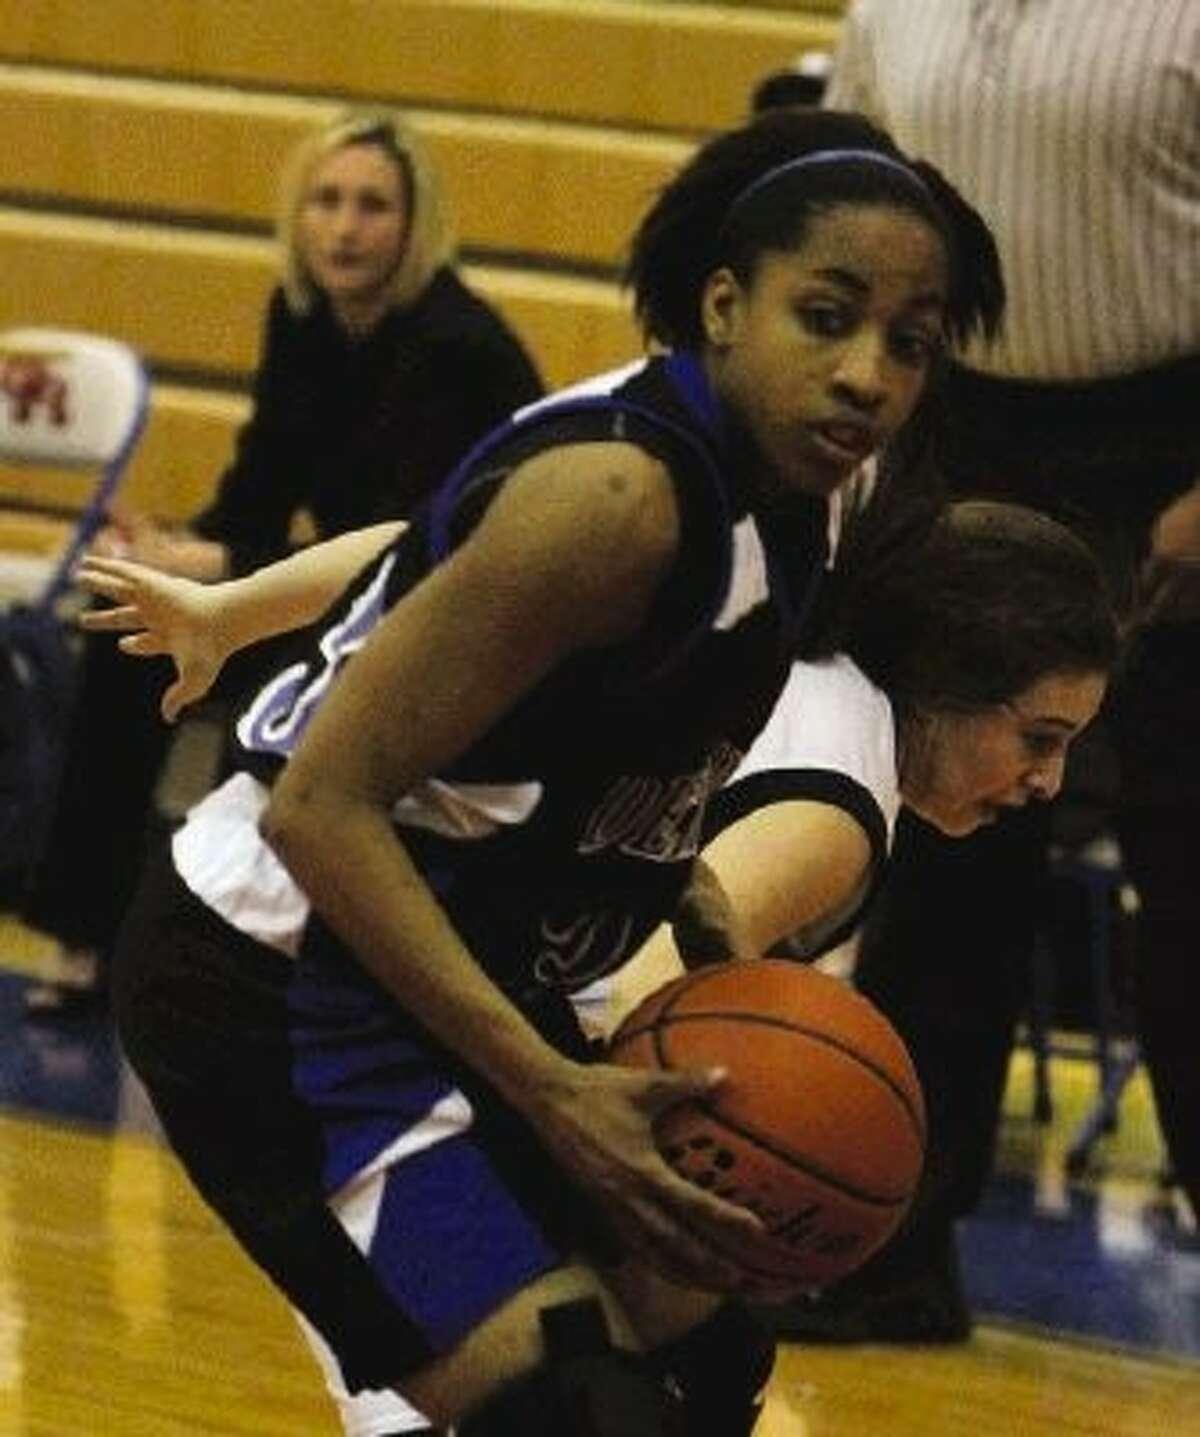 Dekaney's Kayla Nevitt (23) gets past a Kingwood defender for an easy basket during the girls basketball bi-district playoff game at Oak Ridge High School on Feb. 13.